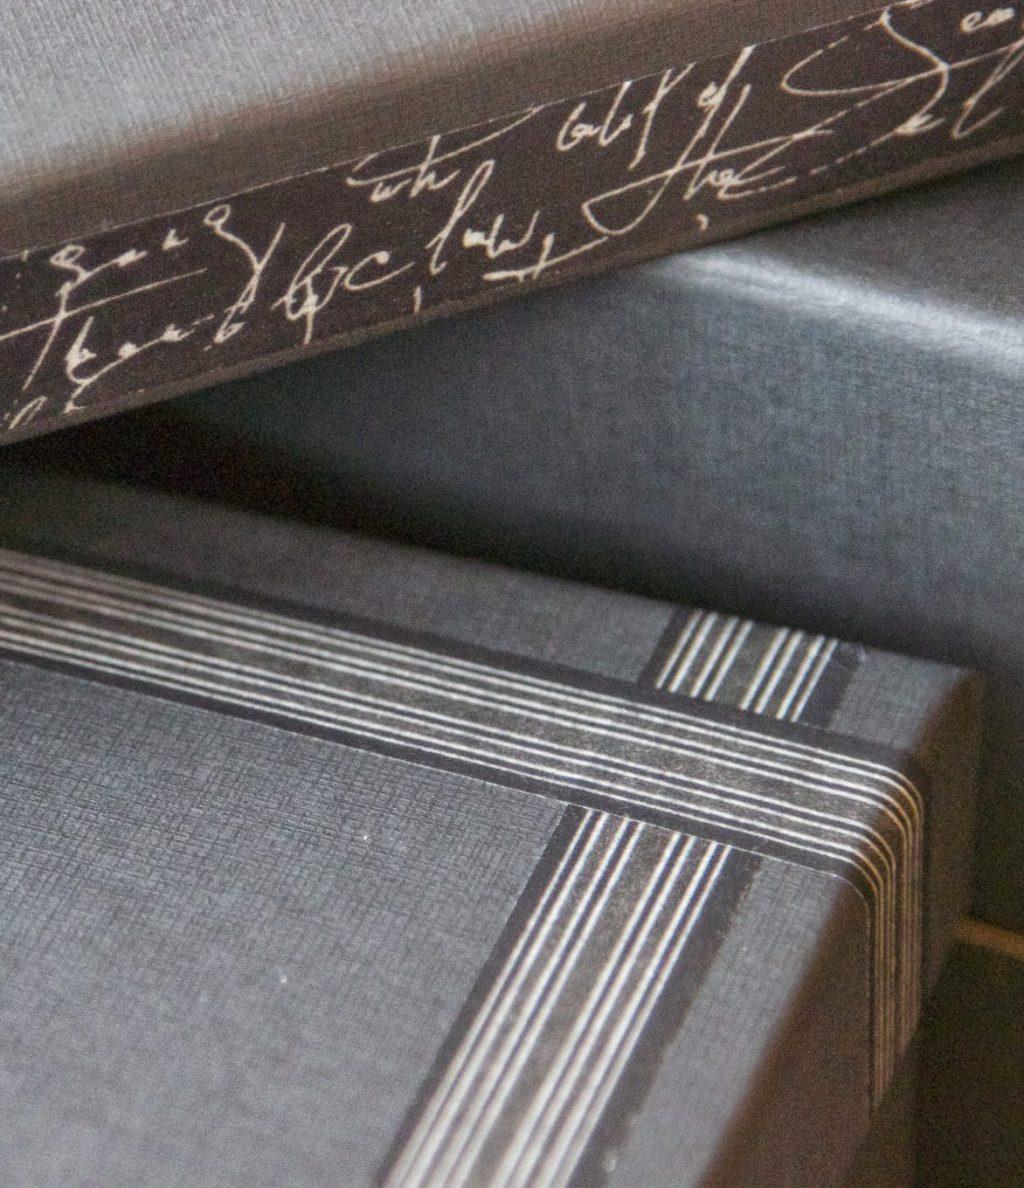 Ikea opbergdozen DIY washi tape Ikea Hack mooie opbergers